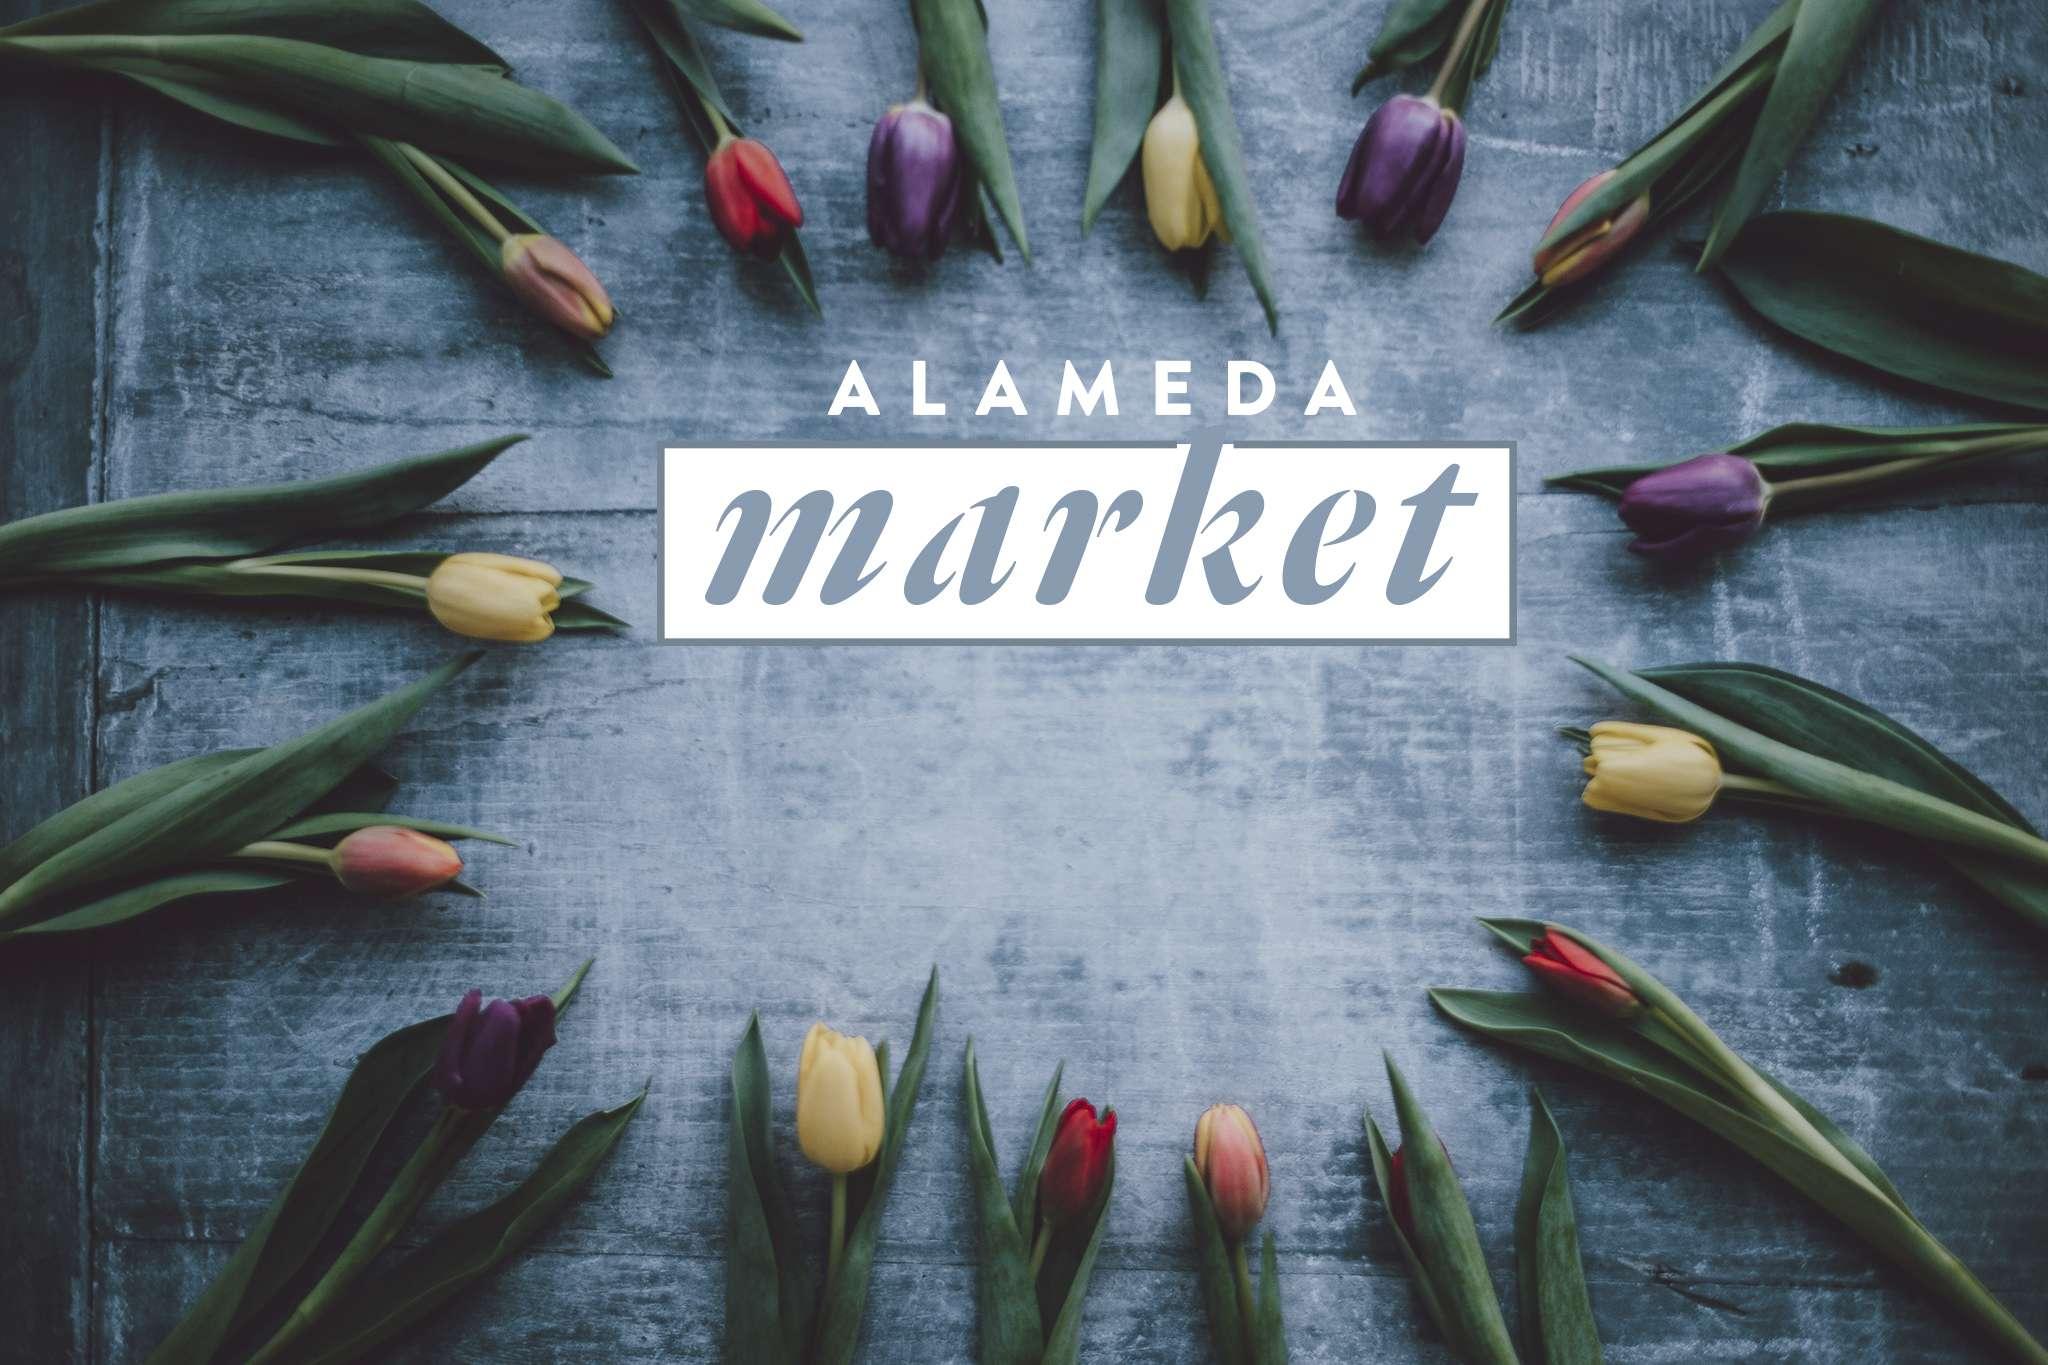 http://alamedamarket.pt/wp-content/uploads/2017/09/Mercado.jpg